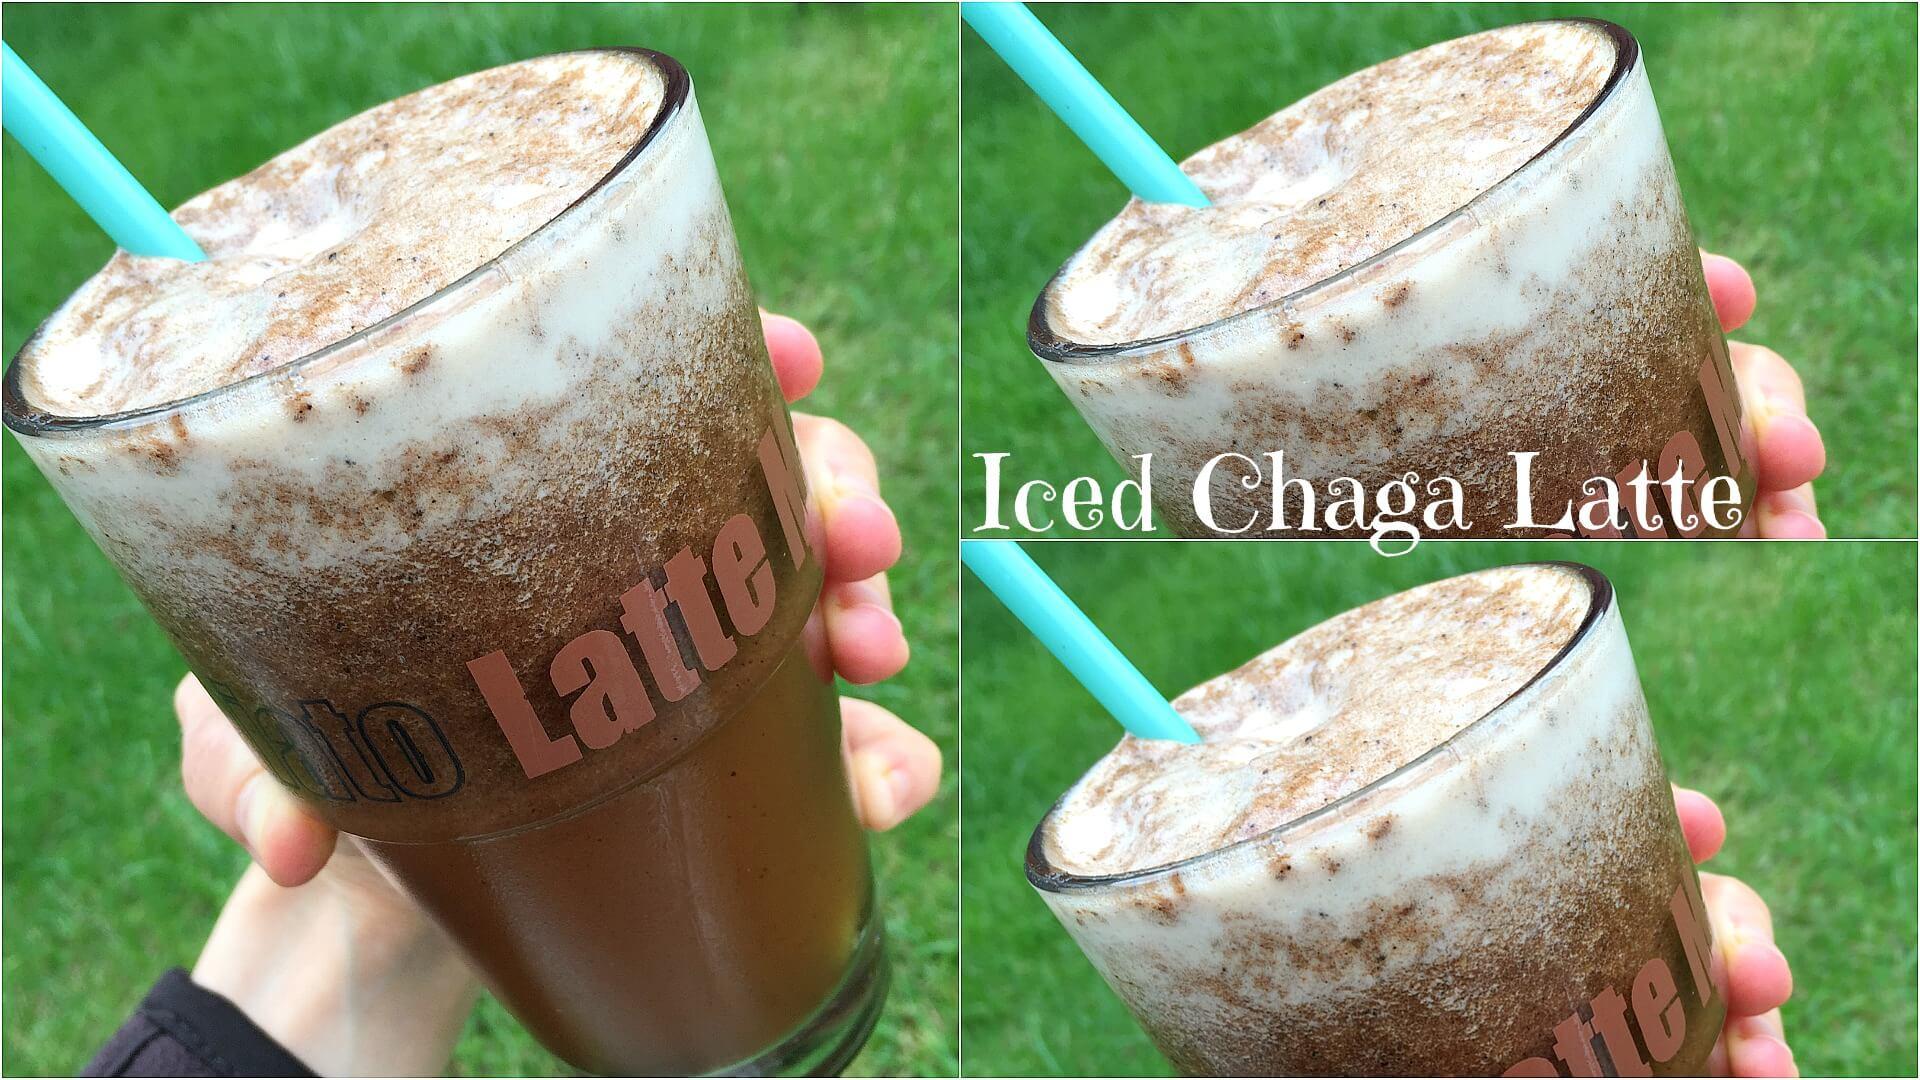 Iced Chaga Latte